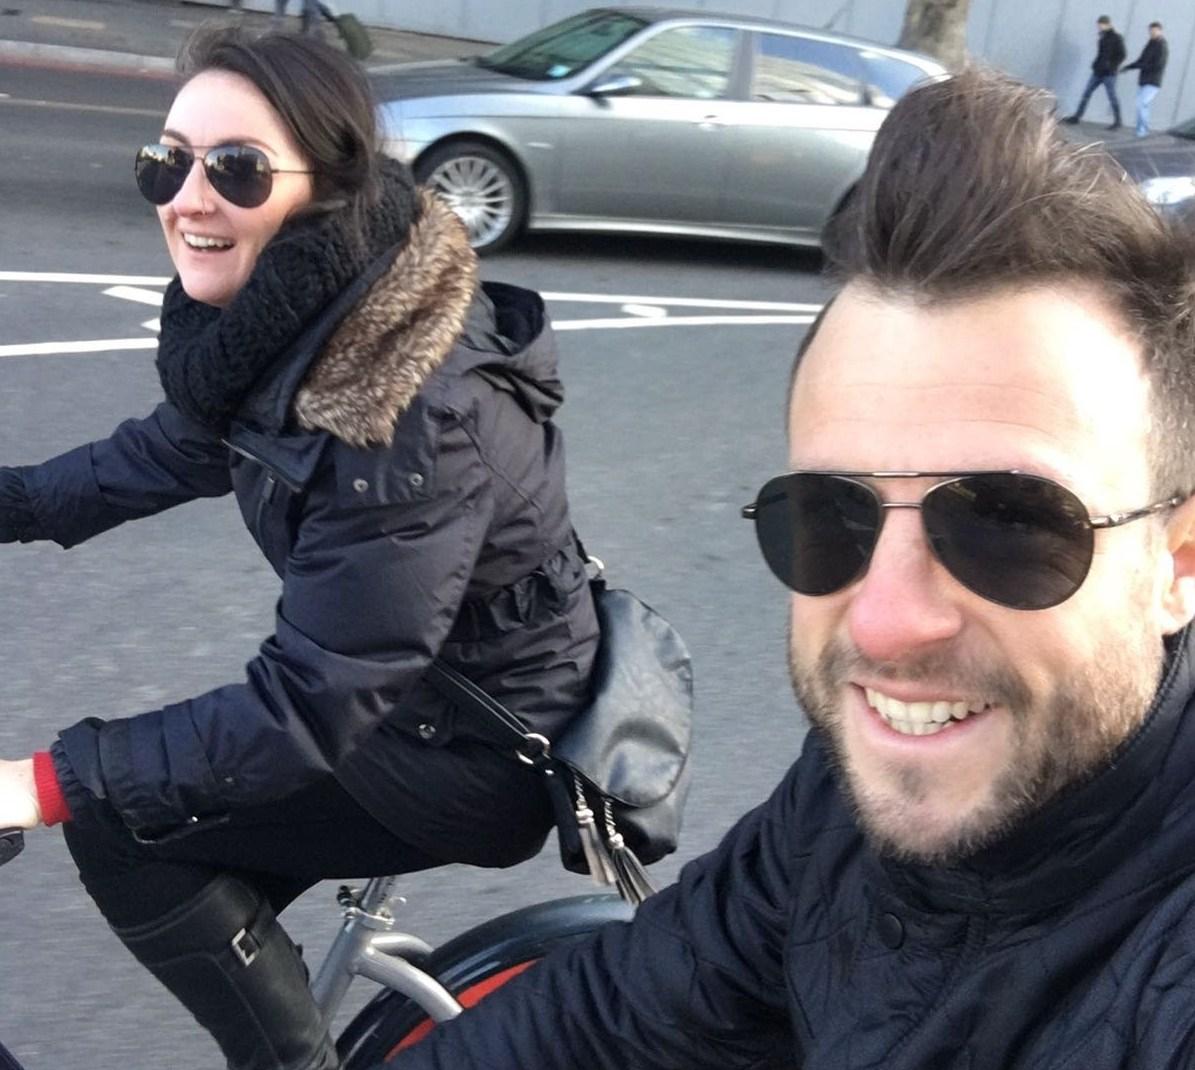 D & I riding through London